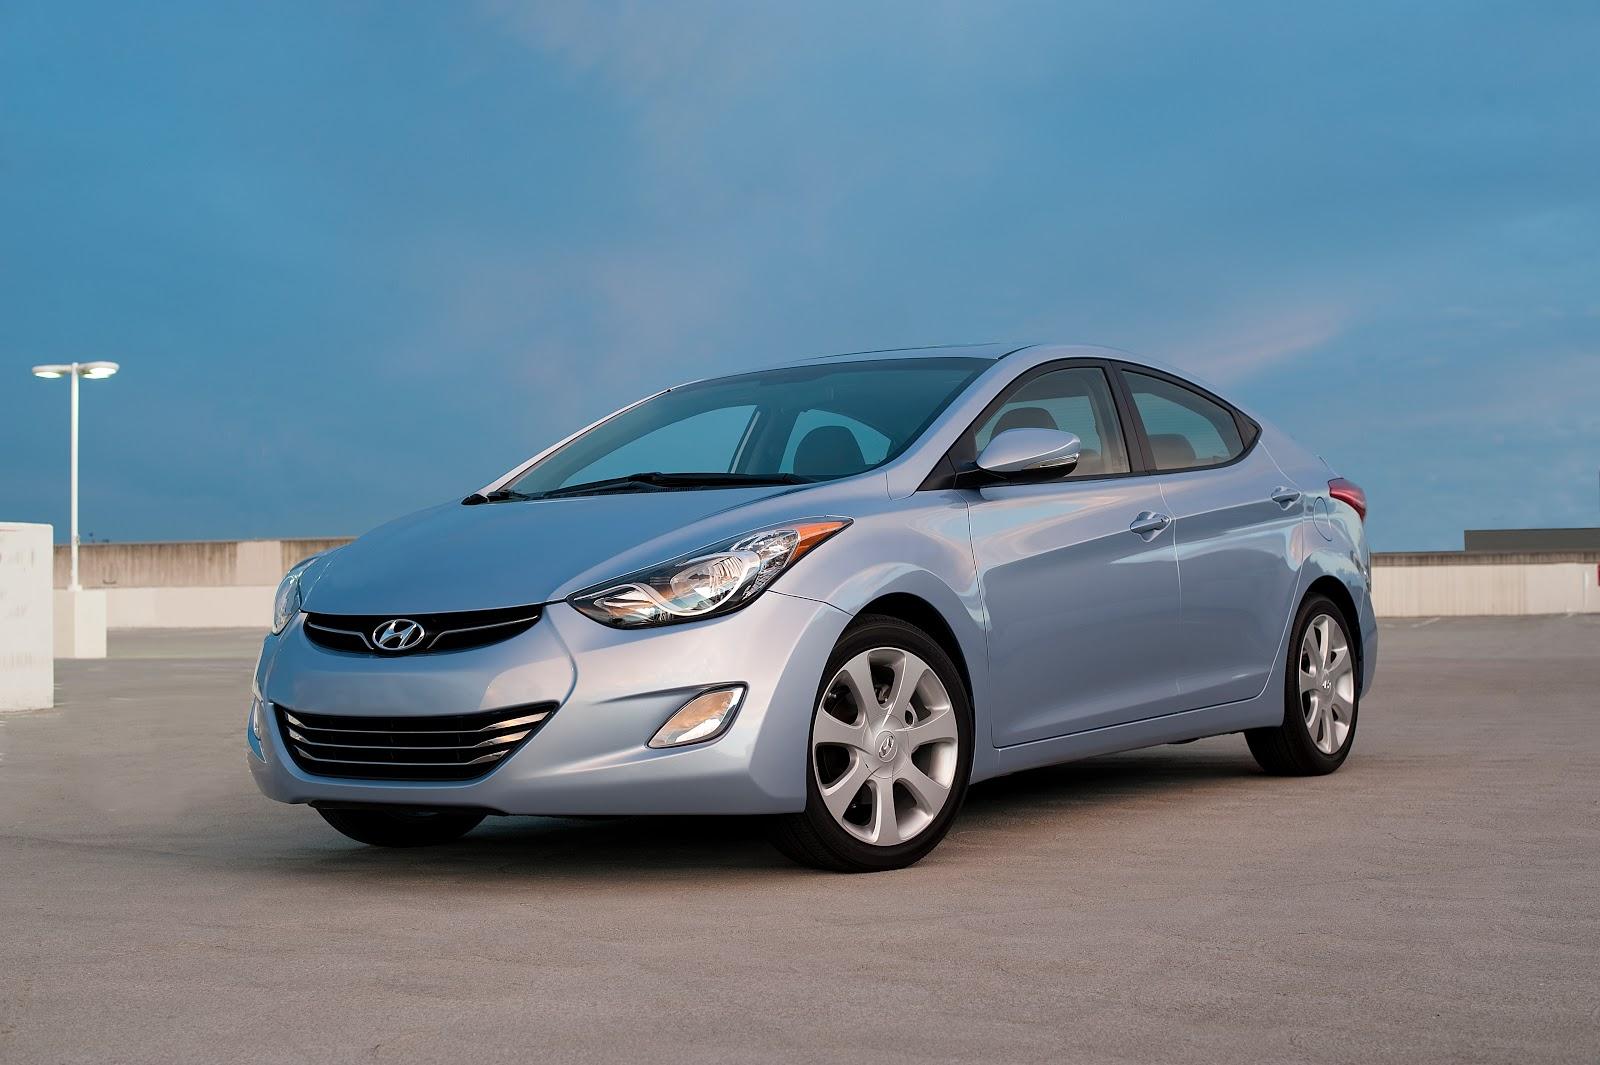 Weeklong Road Test Car Reviews by James Hamel  2011 Hyundai